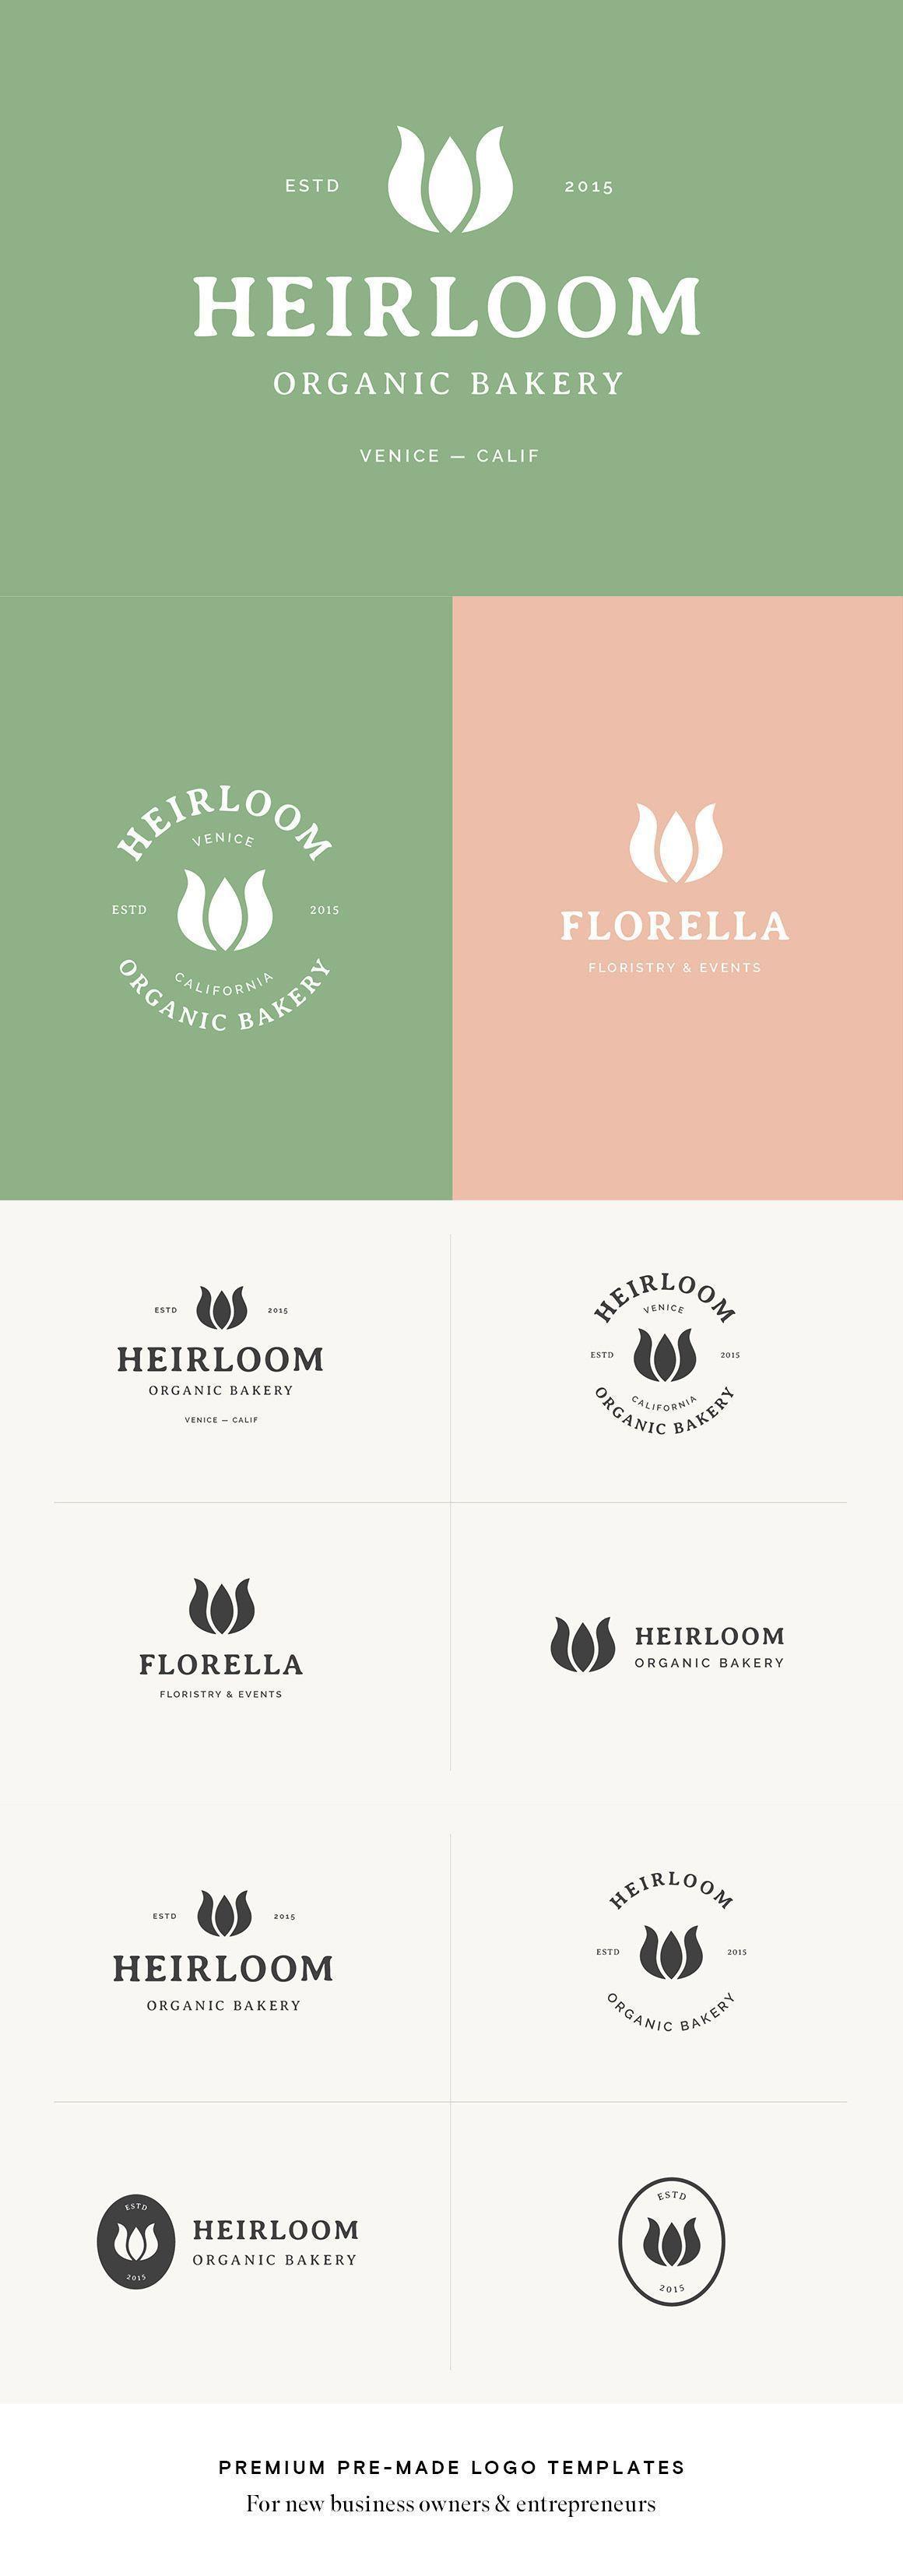 Healthy Food Logo Template I Cafe Logo I Nutritionist Logo #premadelogo #logotem...  Healthy Food Logo Template I Cafe Logo I Nutritionist Logo #premadelogo #logotem …, #Cafe # … � #Cafe #Food #Healthy #Logo #logotem #Nutritionist #premadelogo #Template